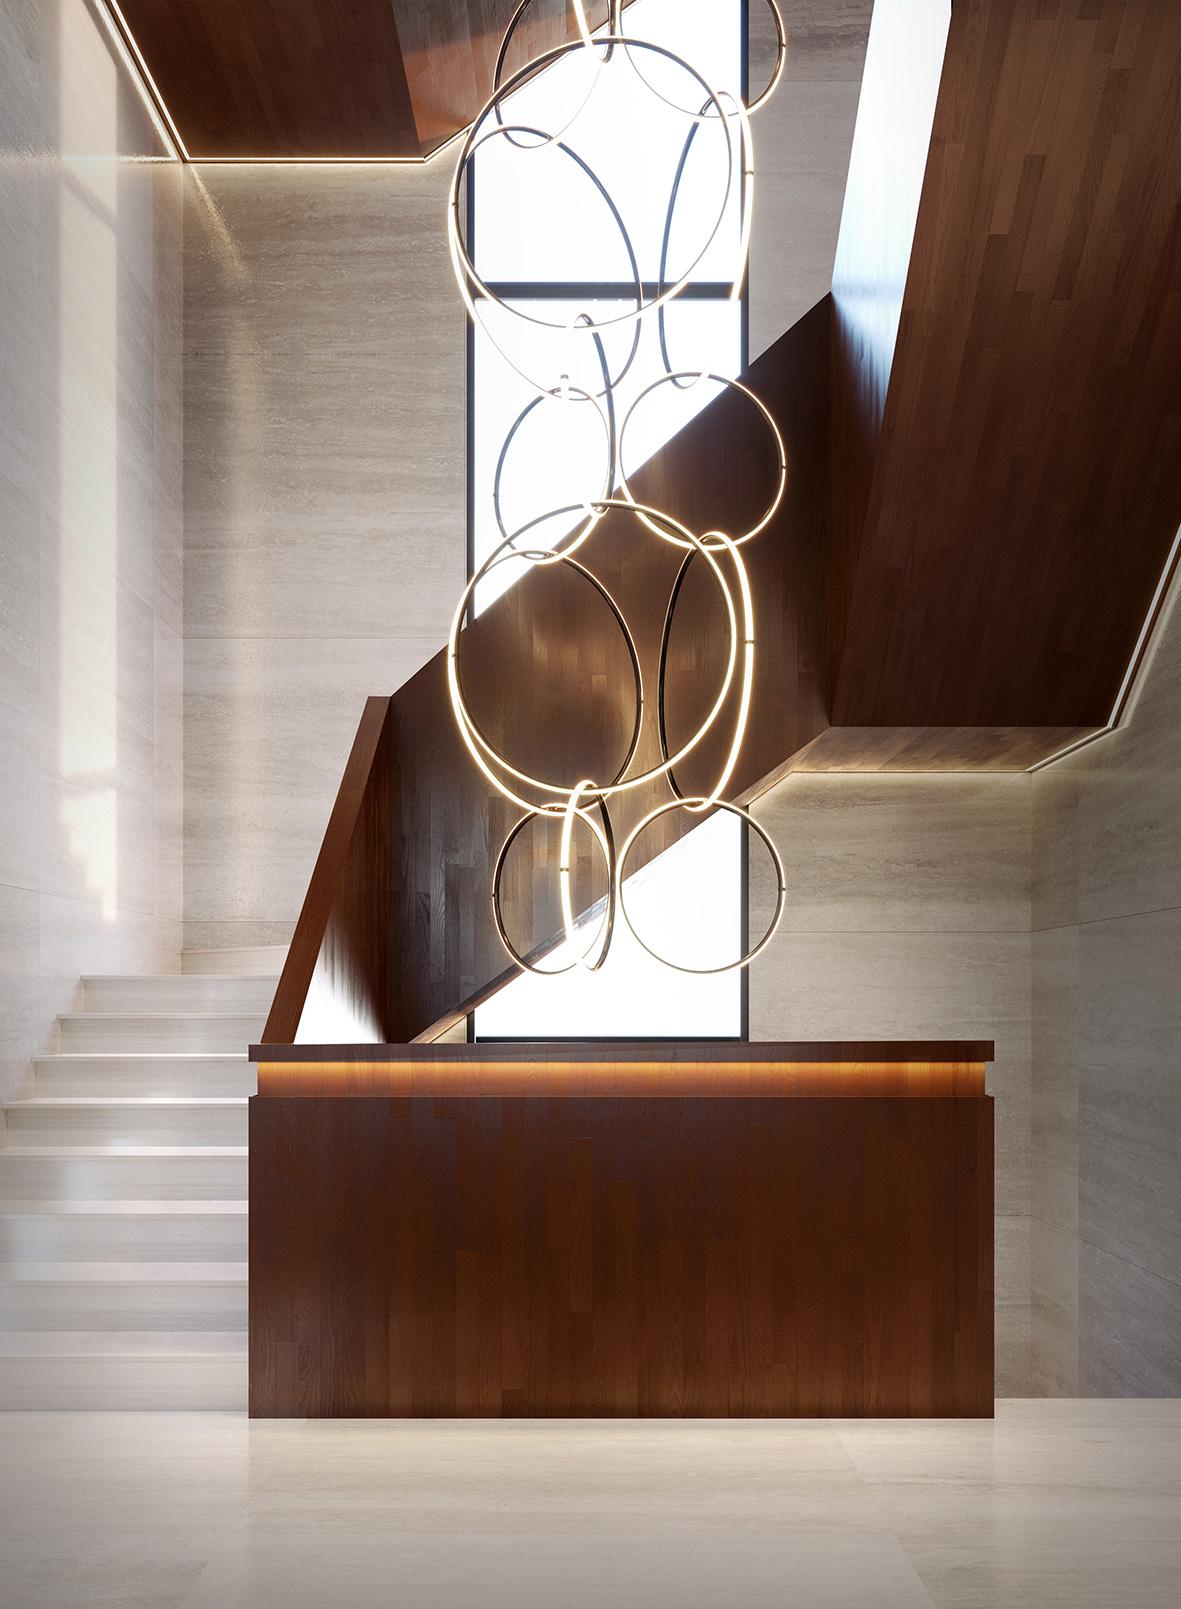 105_Bander-Villa_Cam17_Second-staircase.jpg